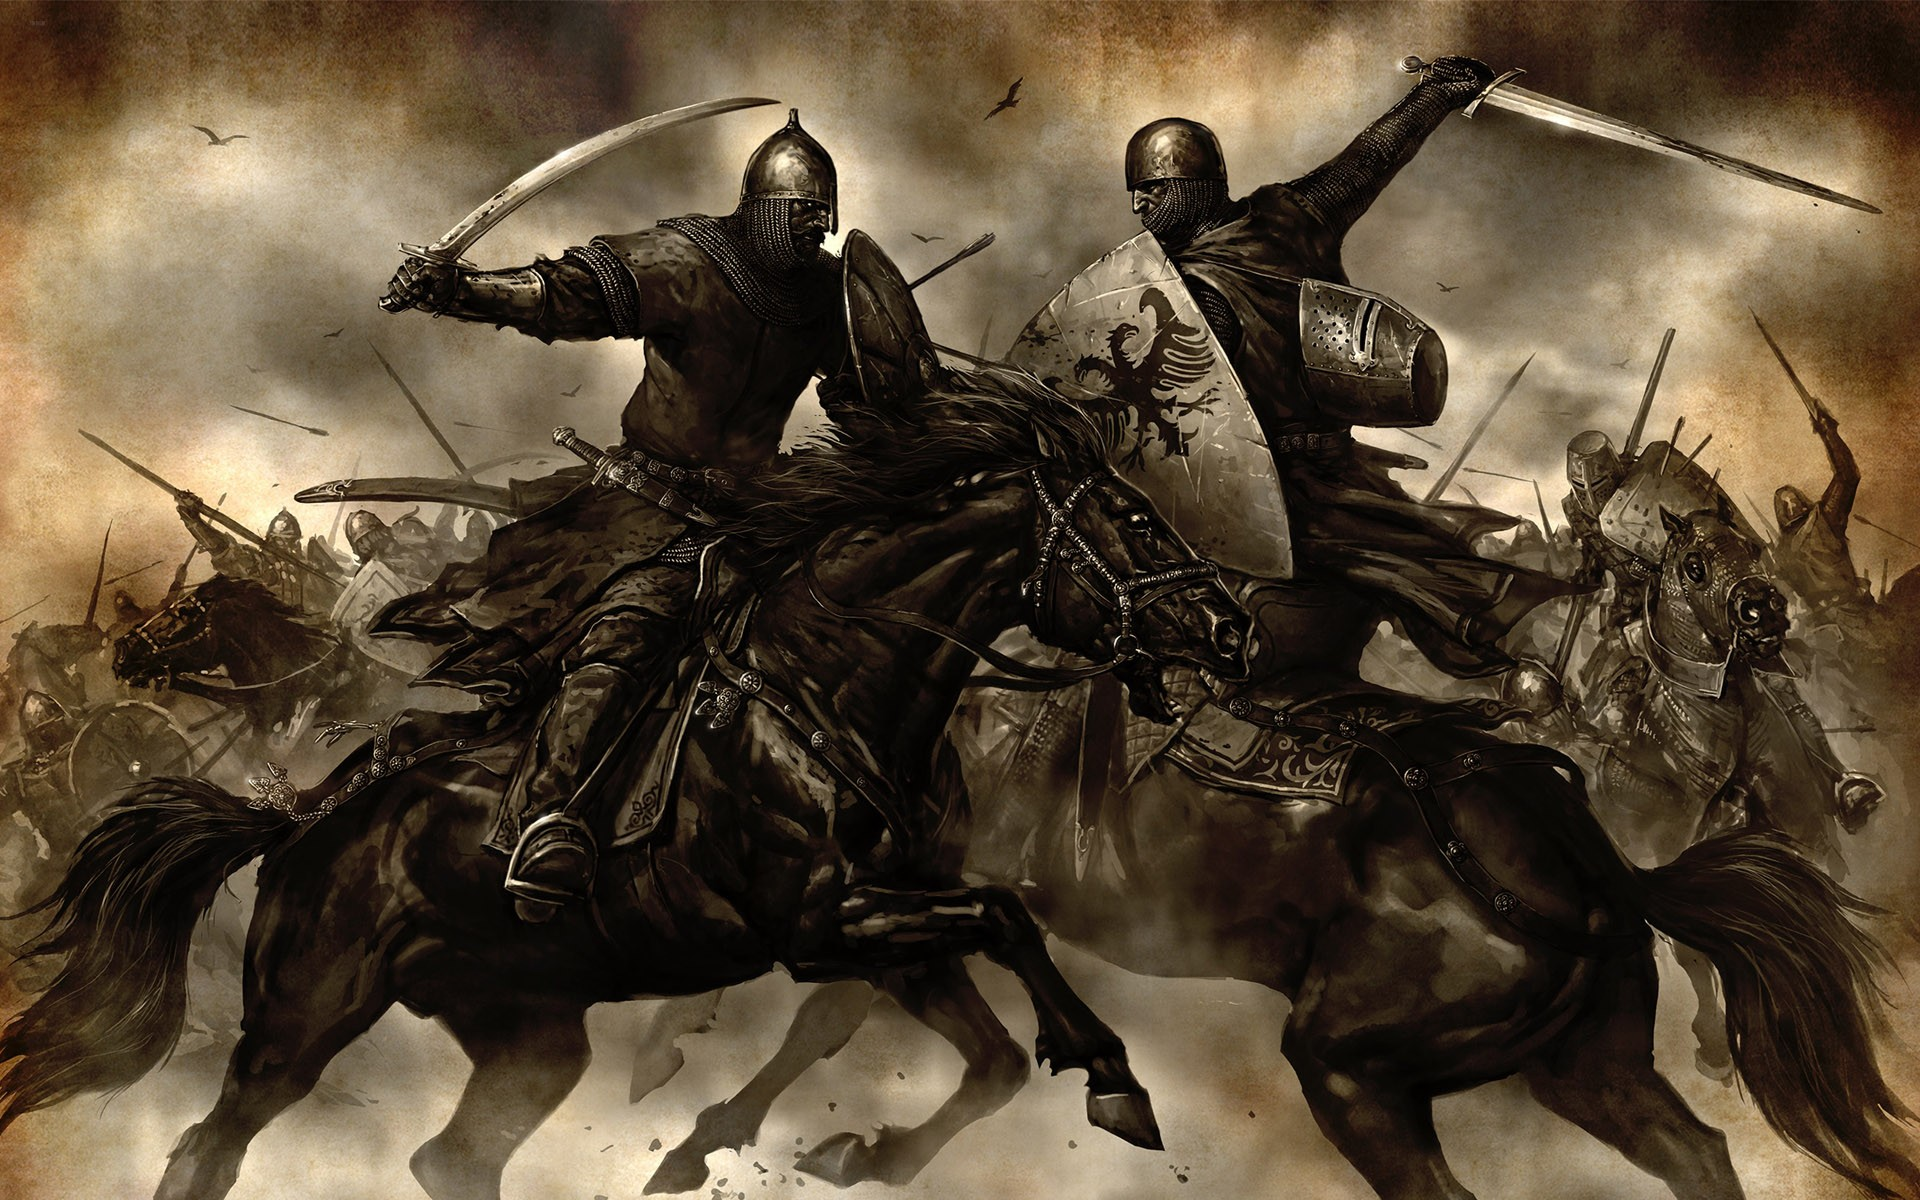 (PHOTO: Battle Image #2 via jonvilma.com)